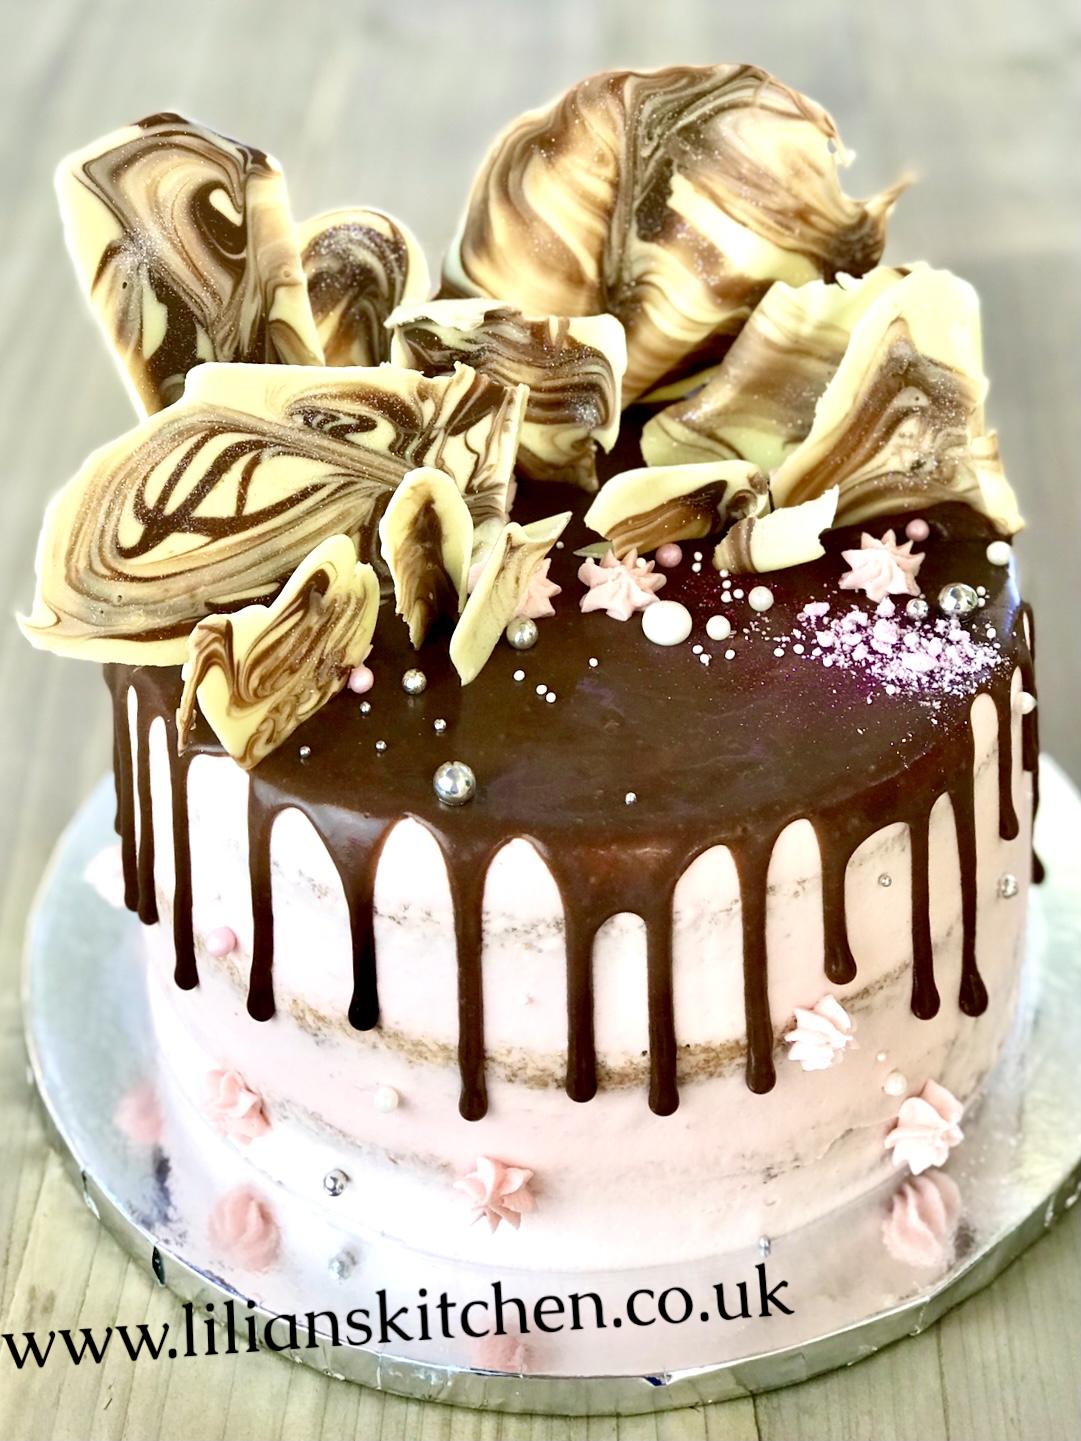 Marbled chocolate shards drip cake